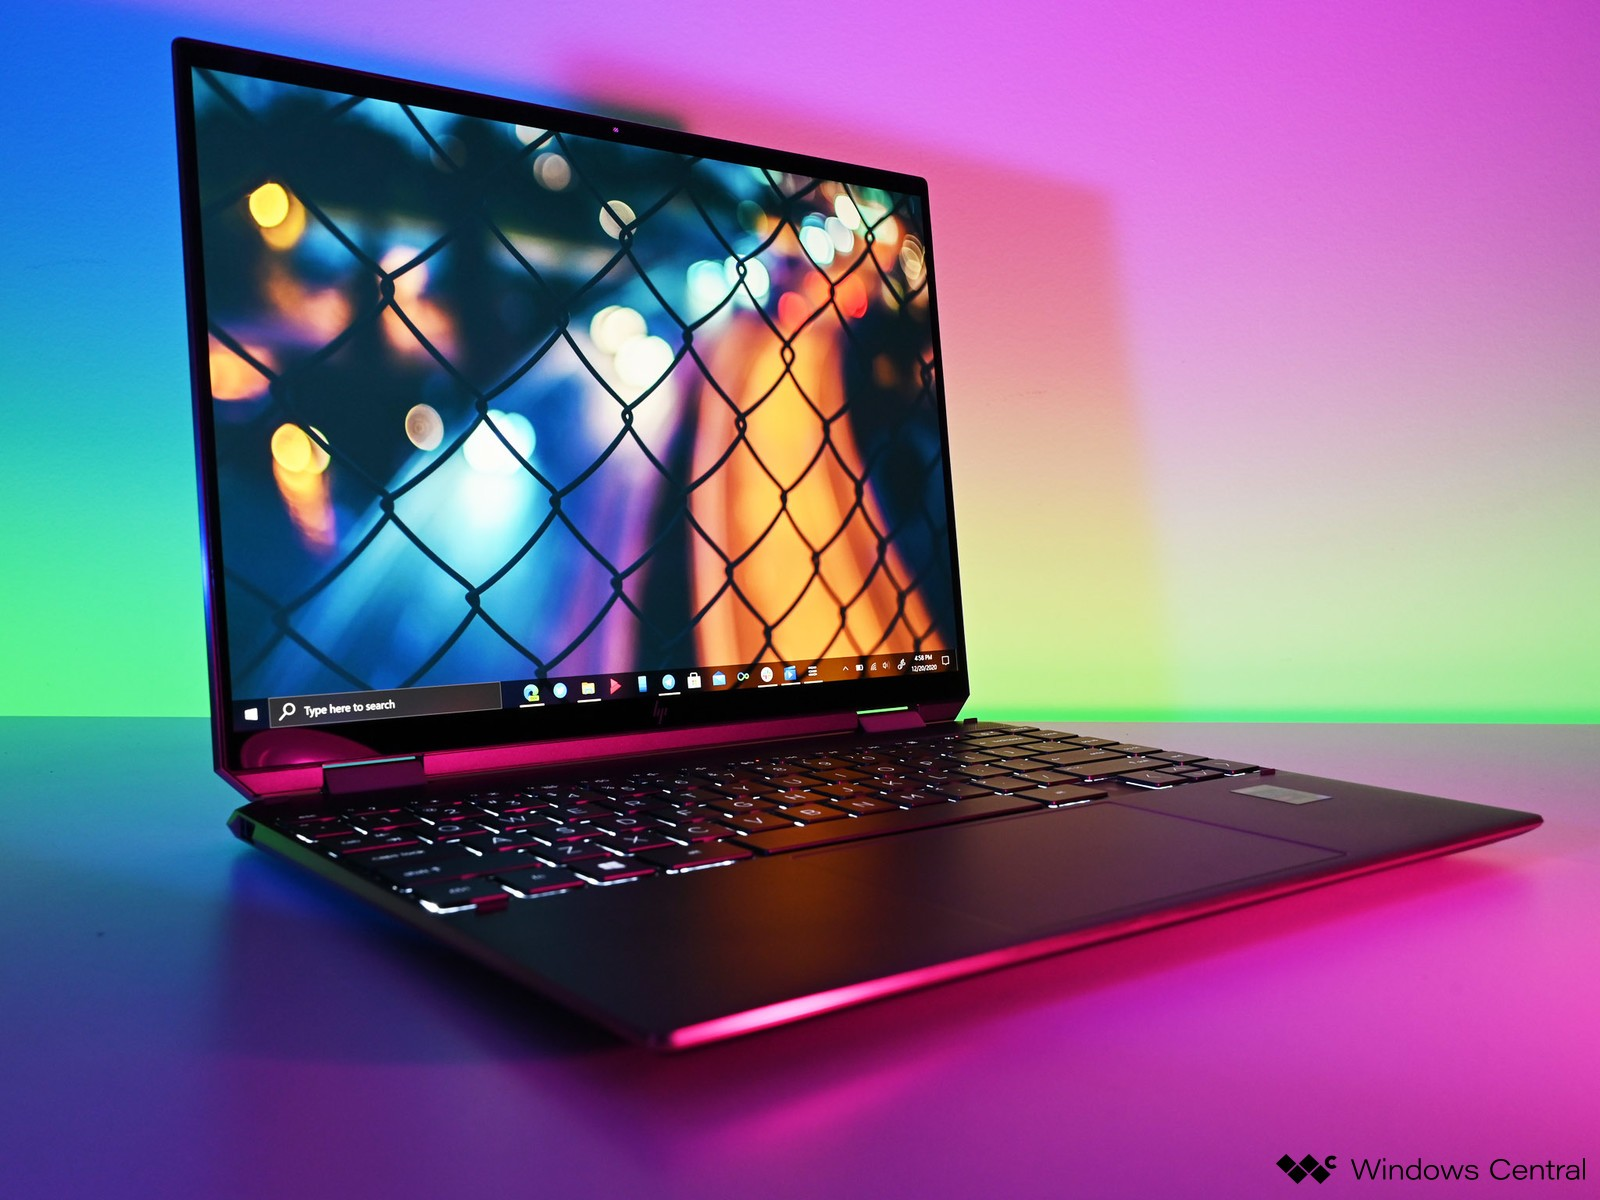 Best Laptop for Under 100p